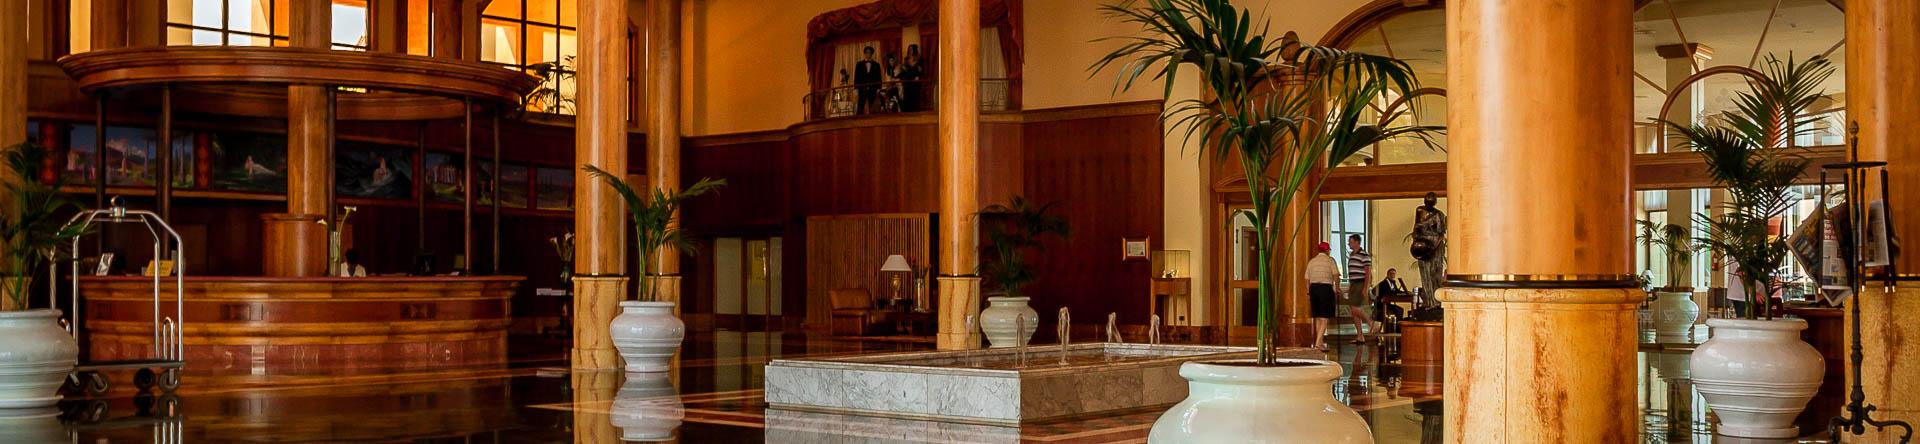 Hôtels, restaurants … -